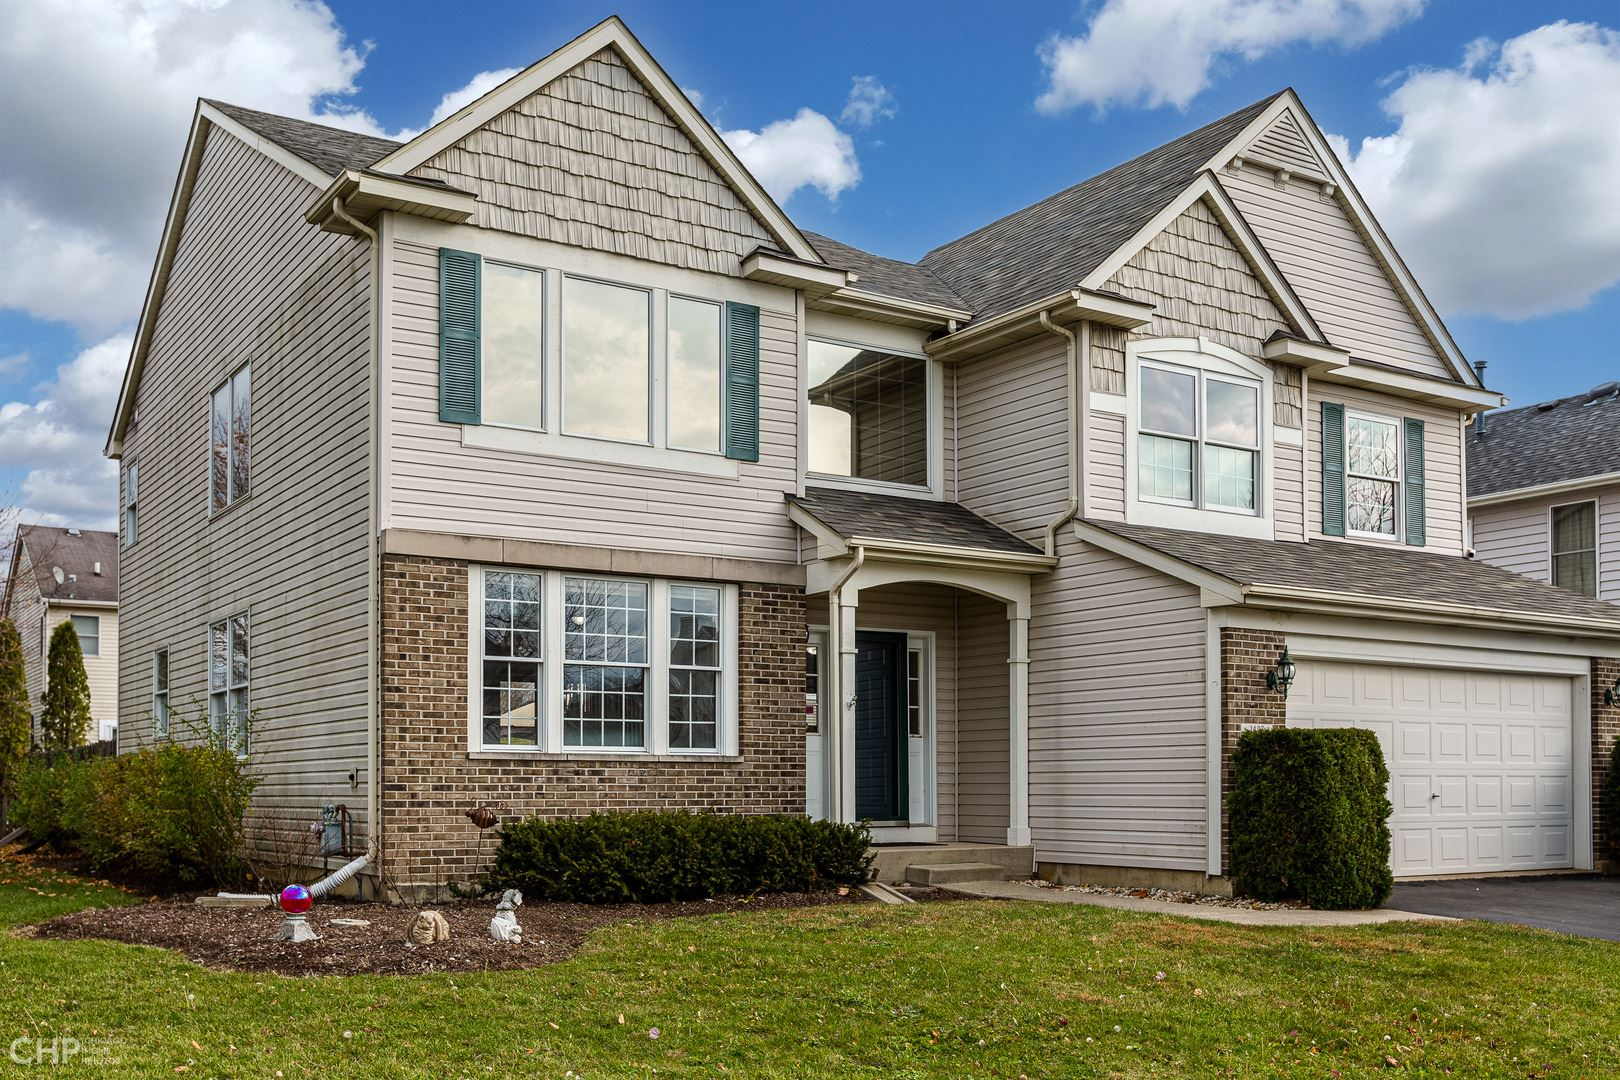 1497 Trailwood Drive, Crystal Lake, IL 60014 - #: 10931678